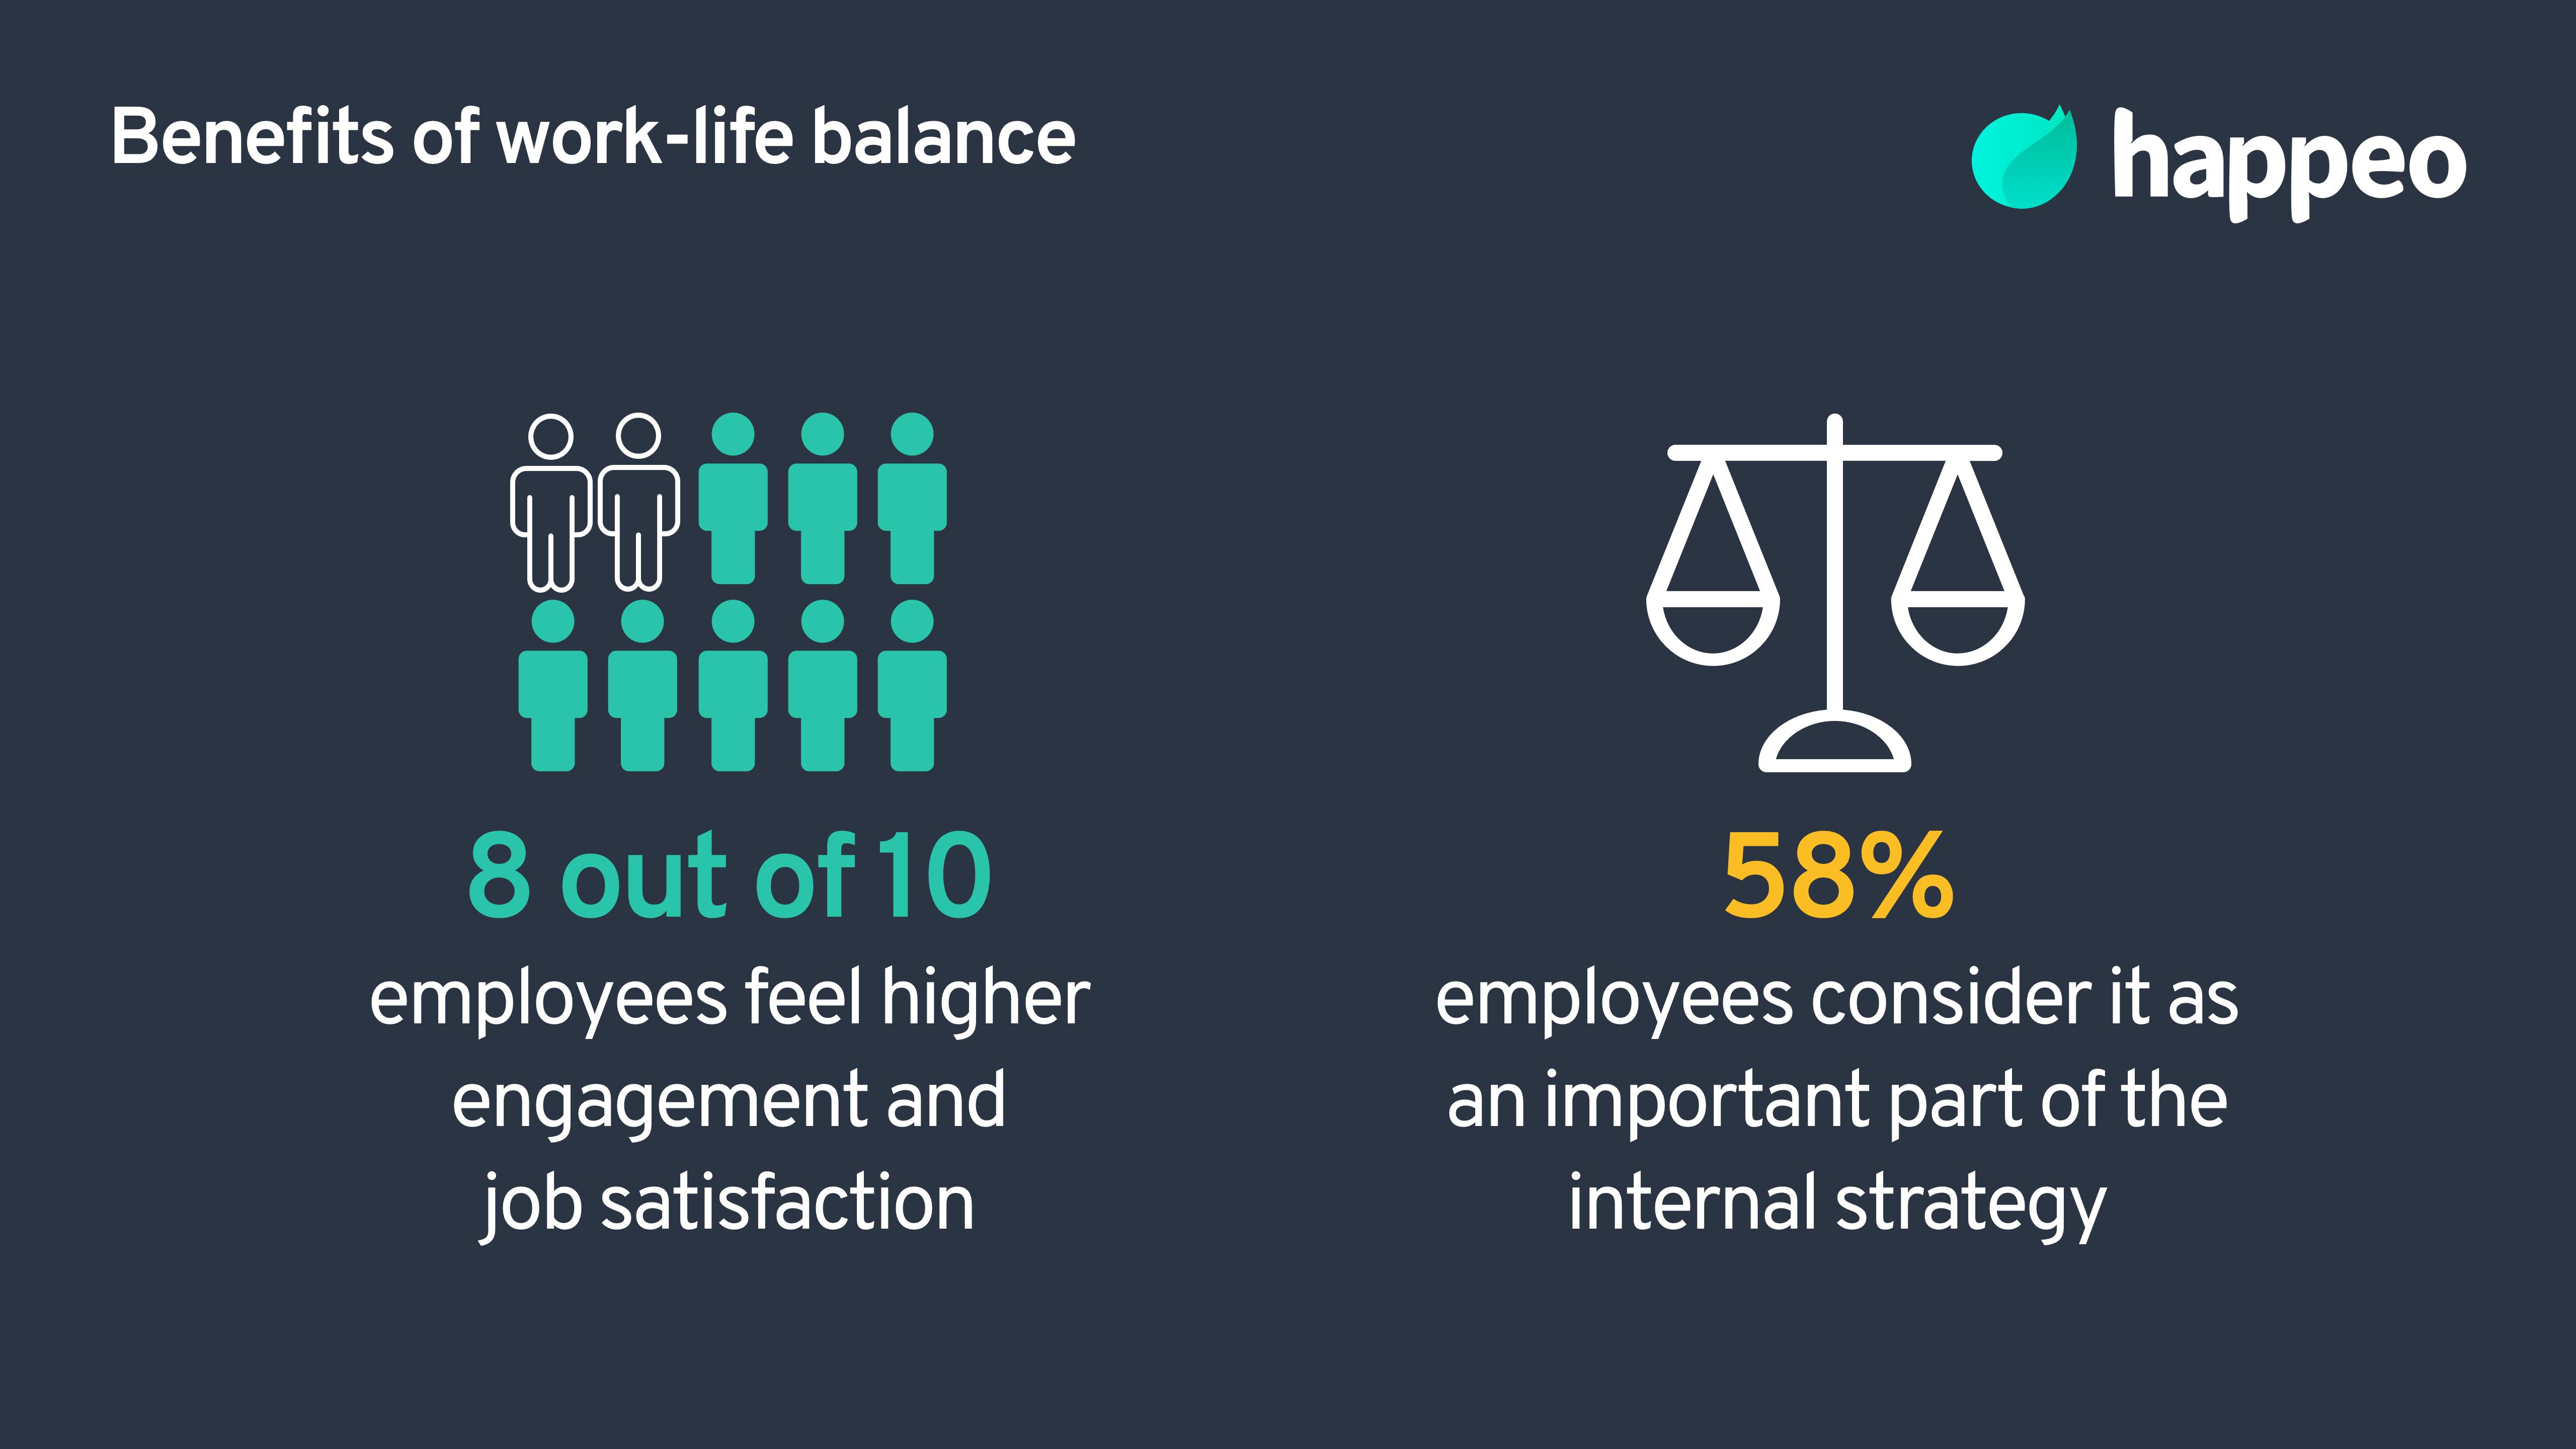 Work-life balance benefits